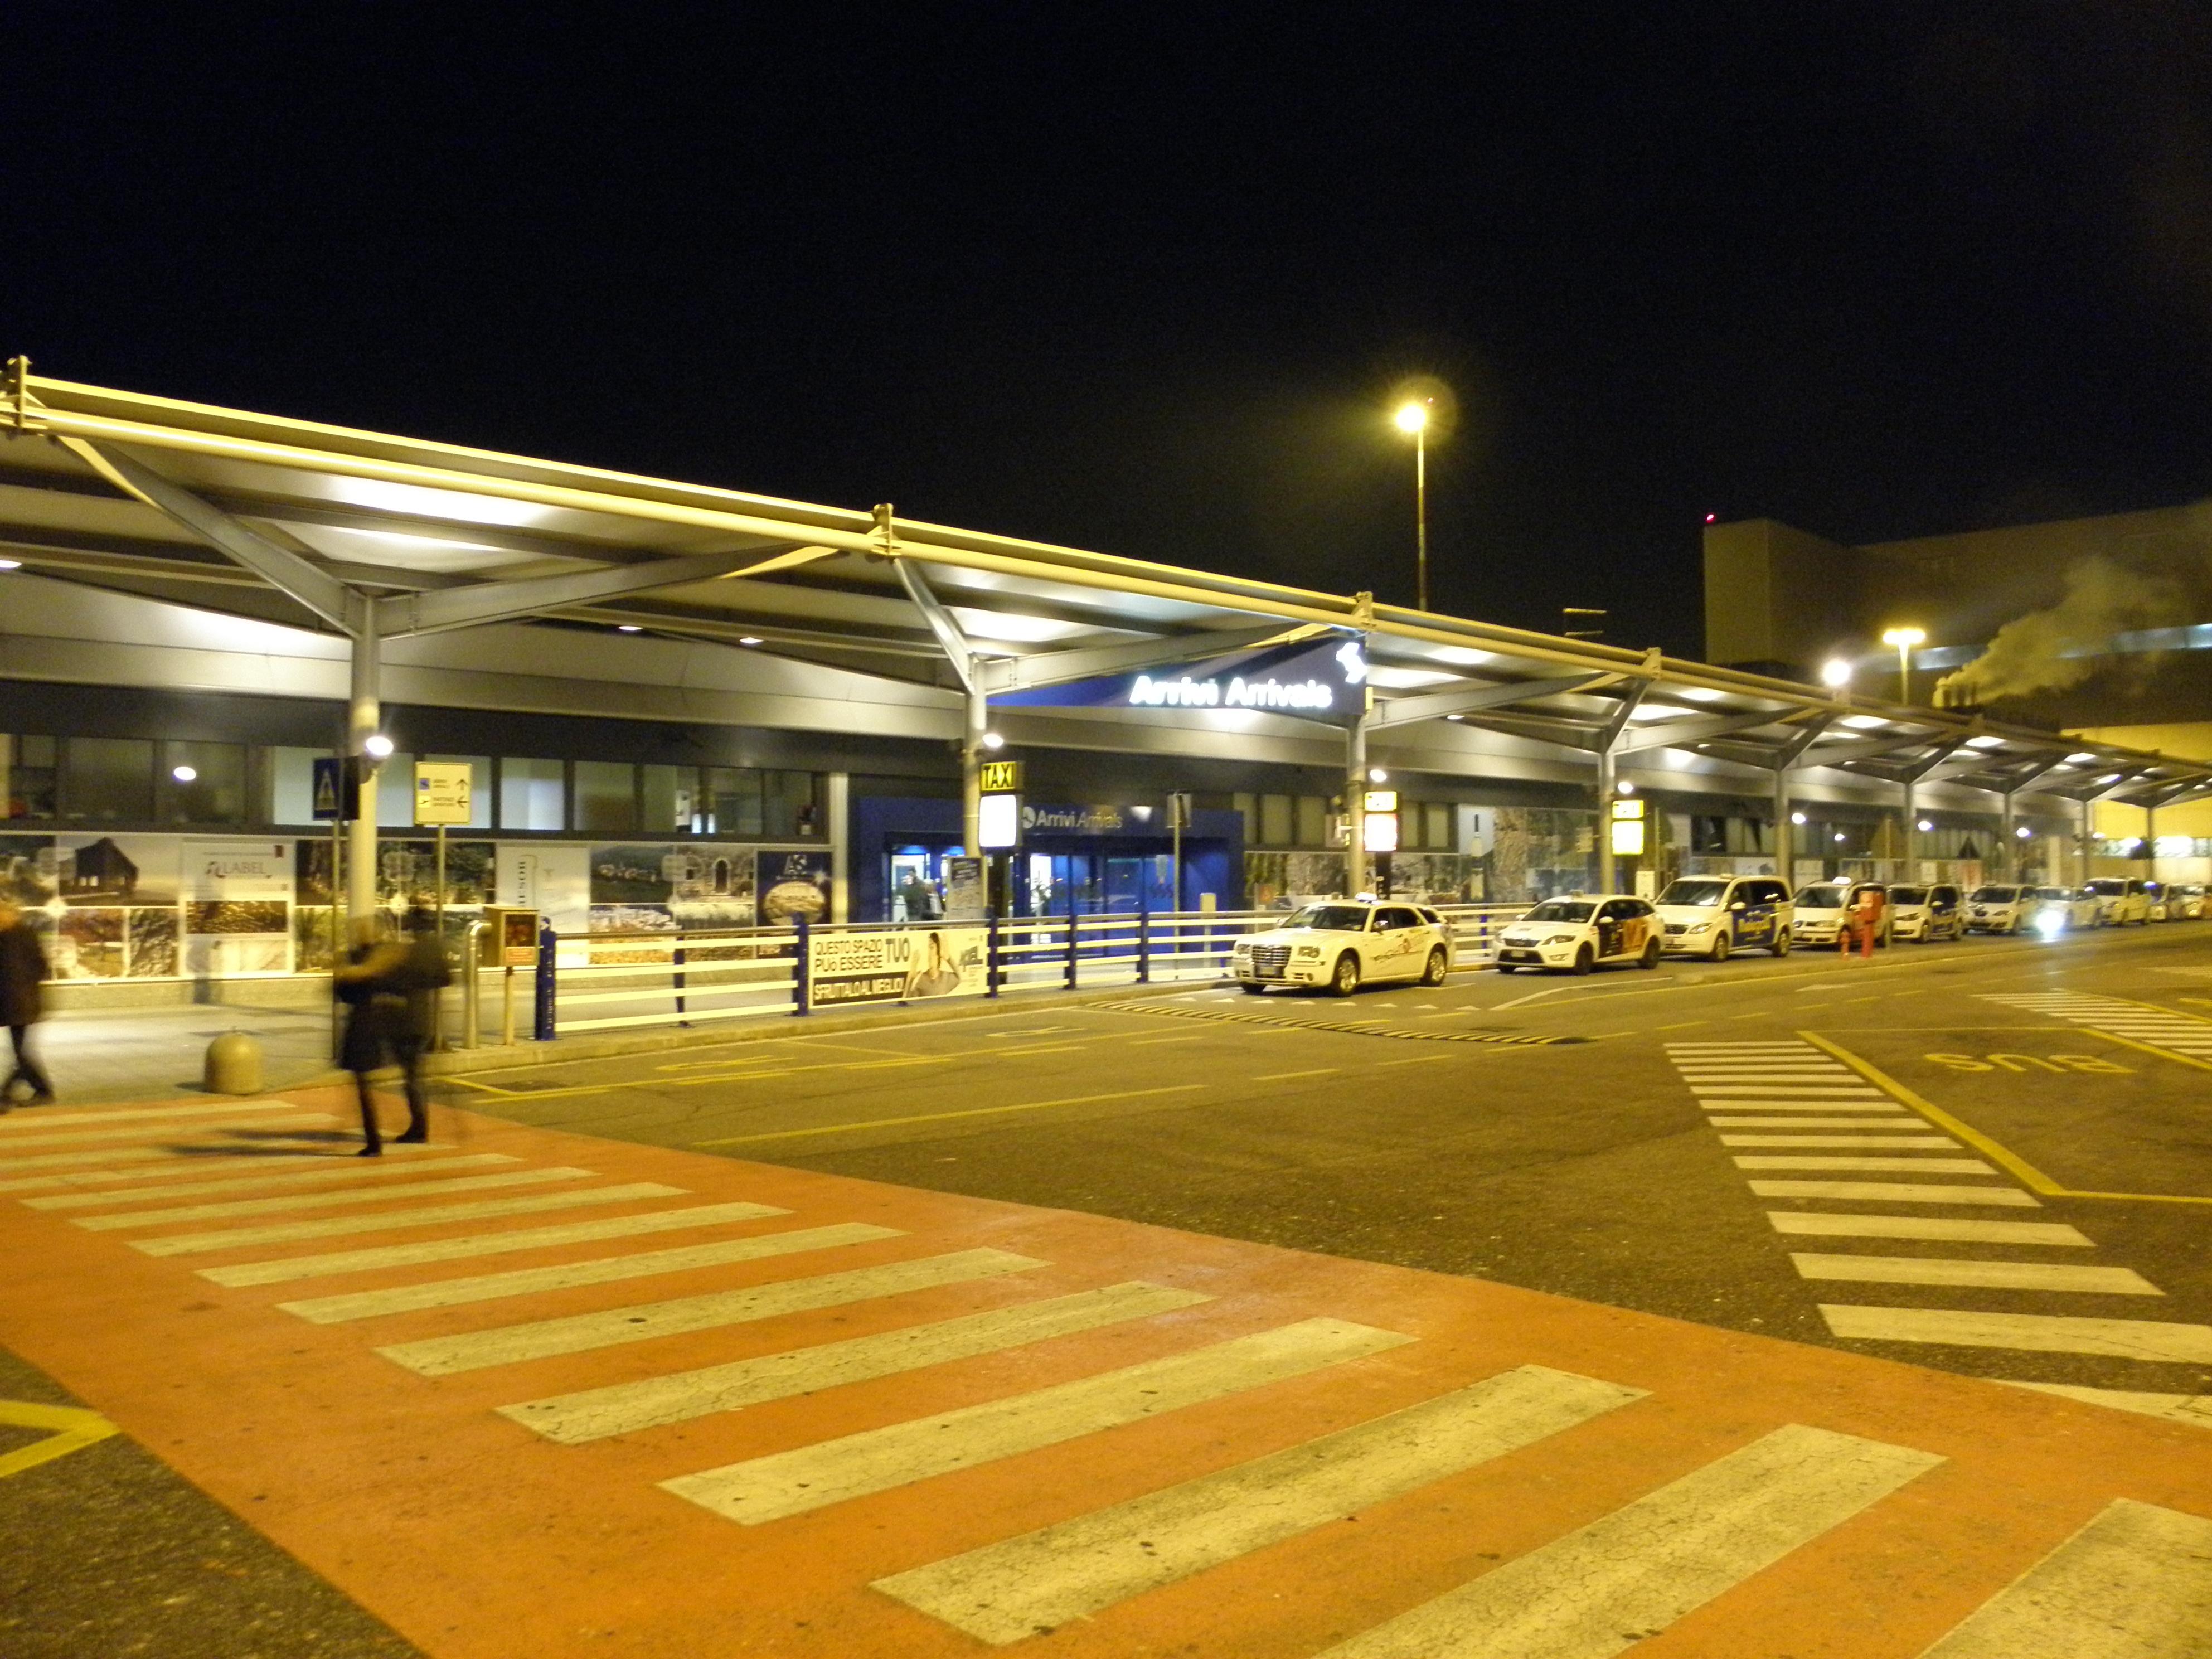 Aeroporto Verona Arrivi : File aeroporto di verona villafranca notturna terminal